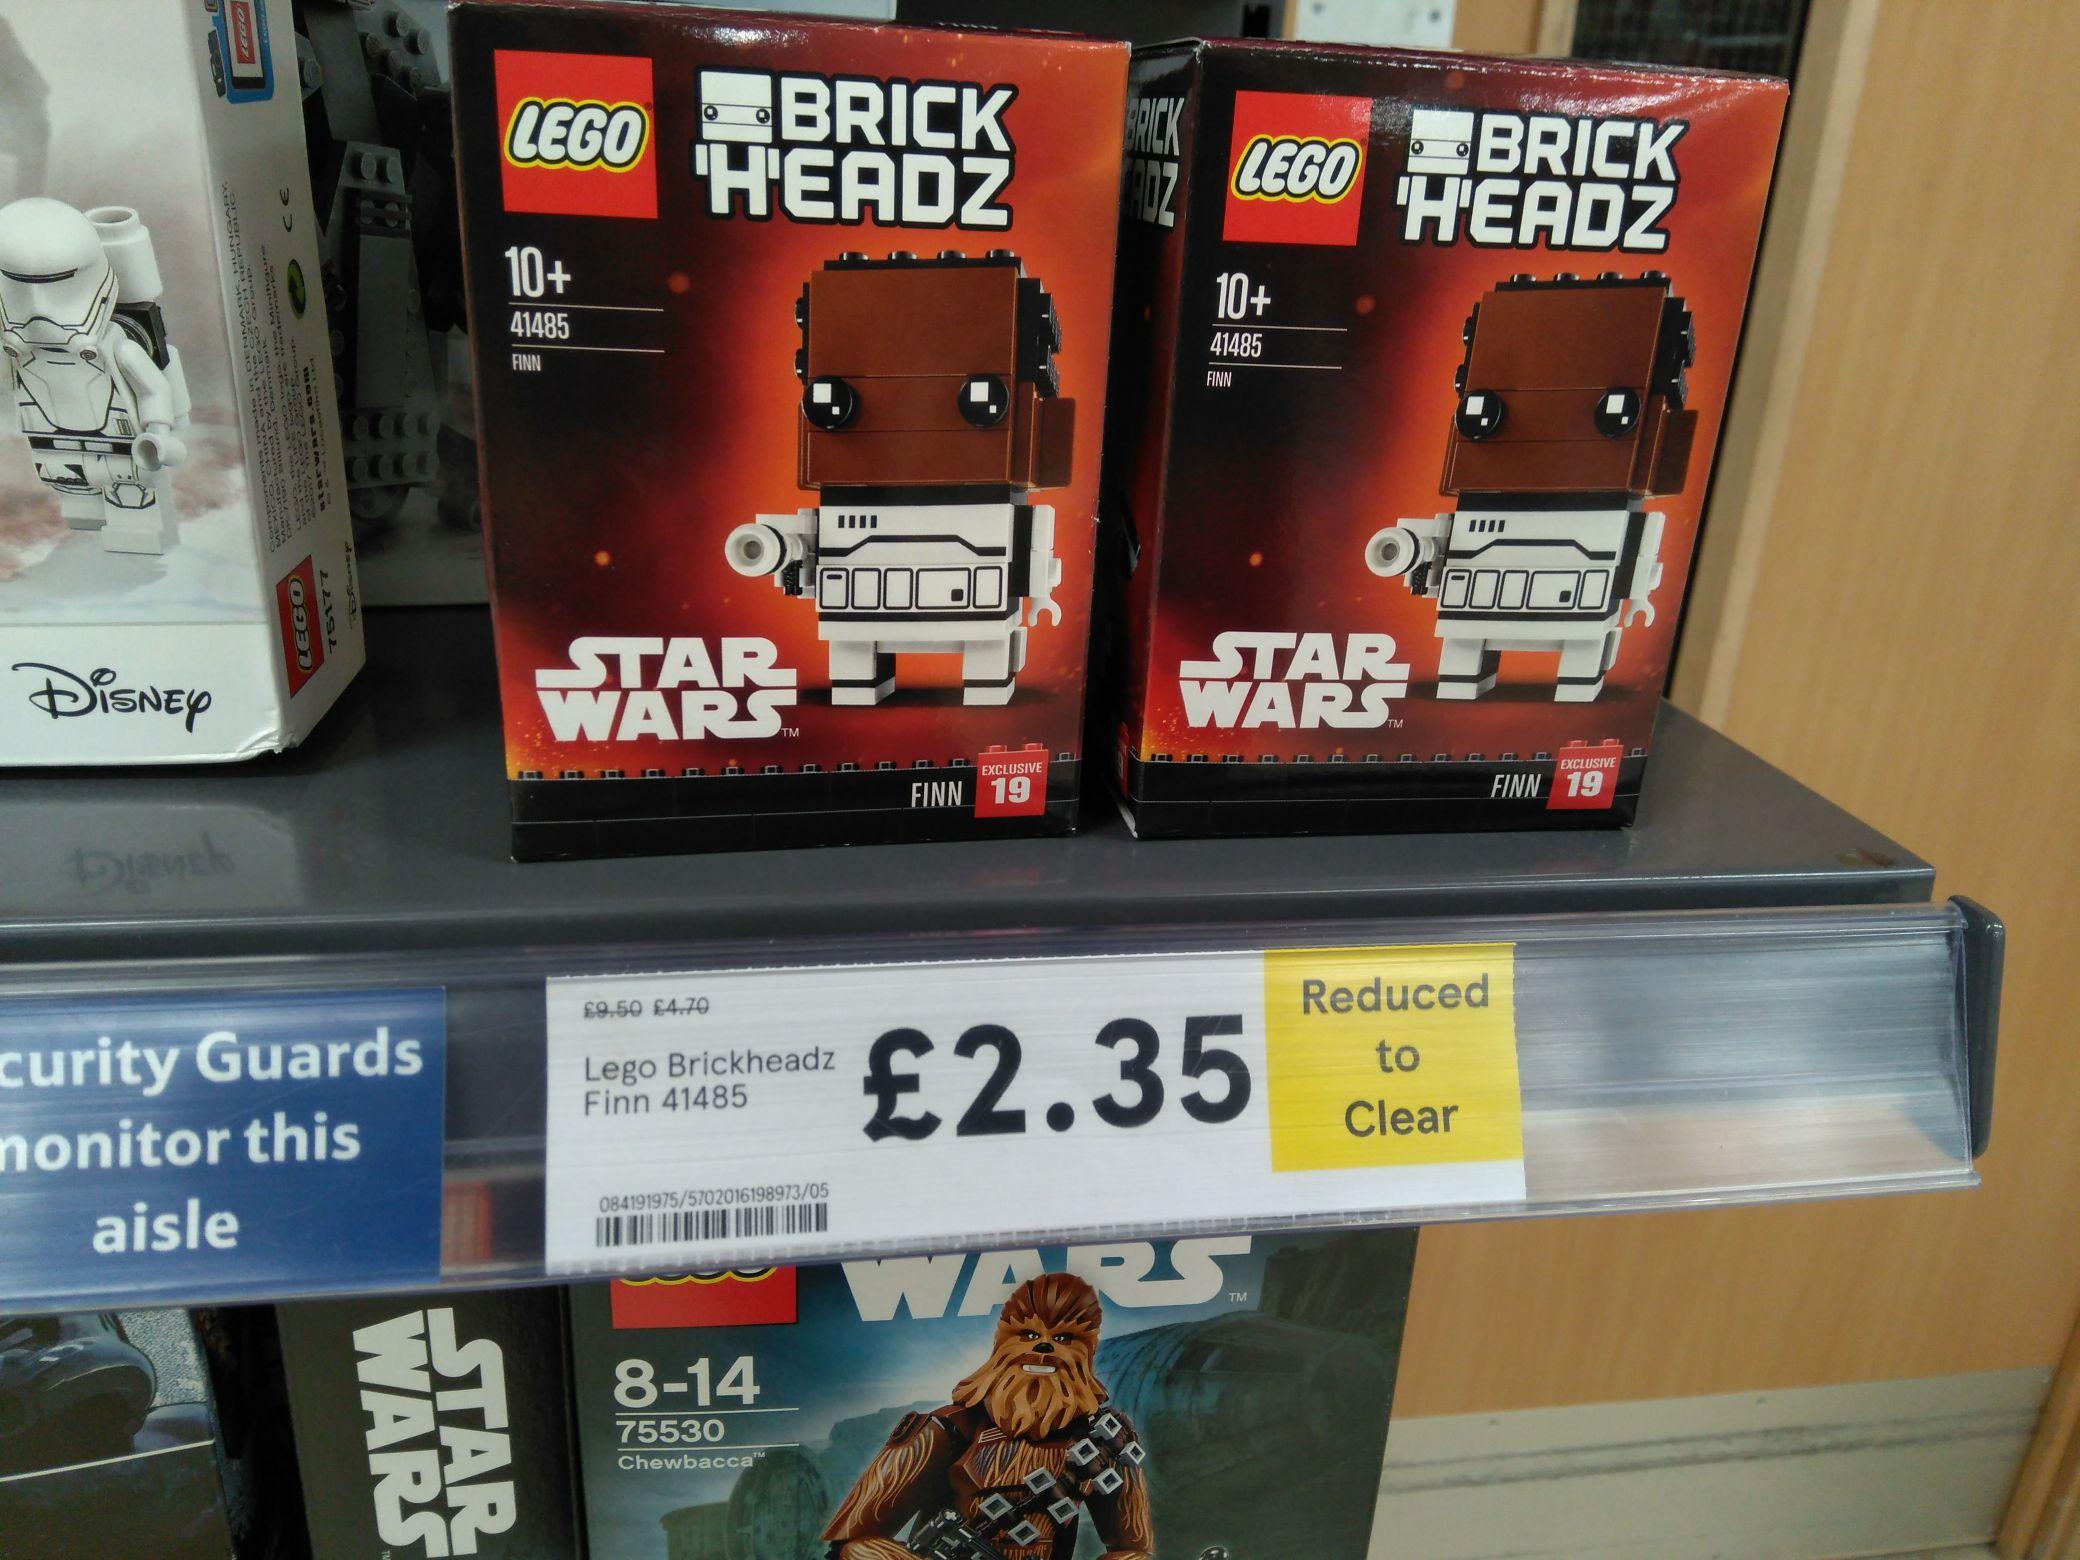 Lego Star Wars brick heads £2.35 in-store Tesco failsworth